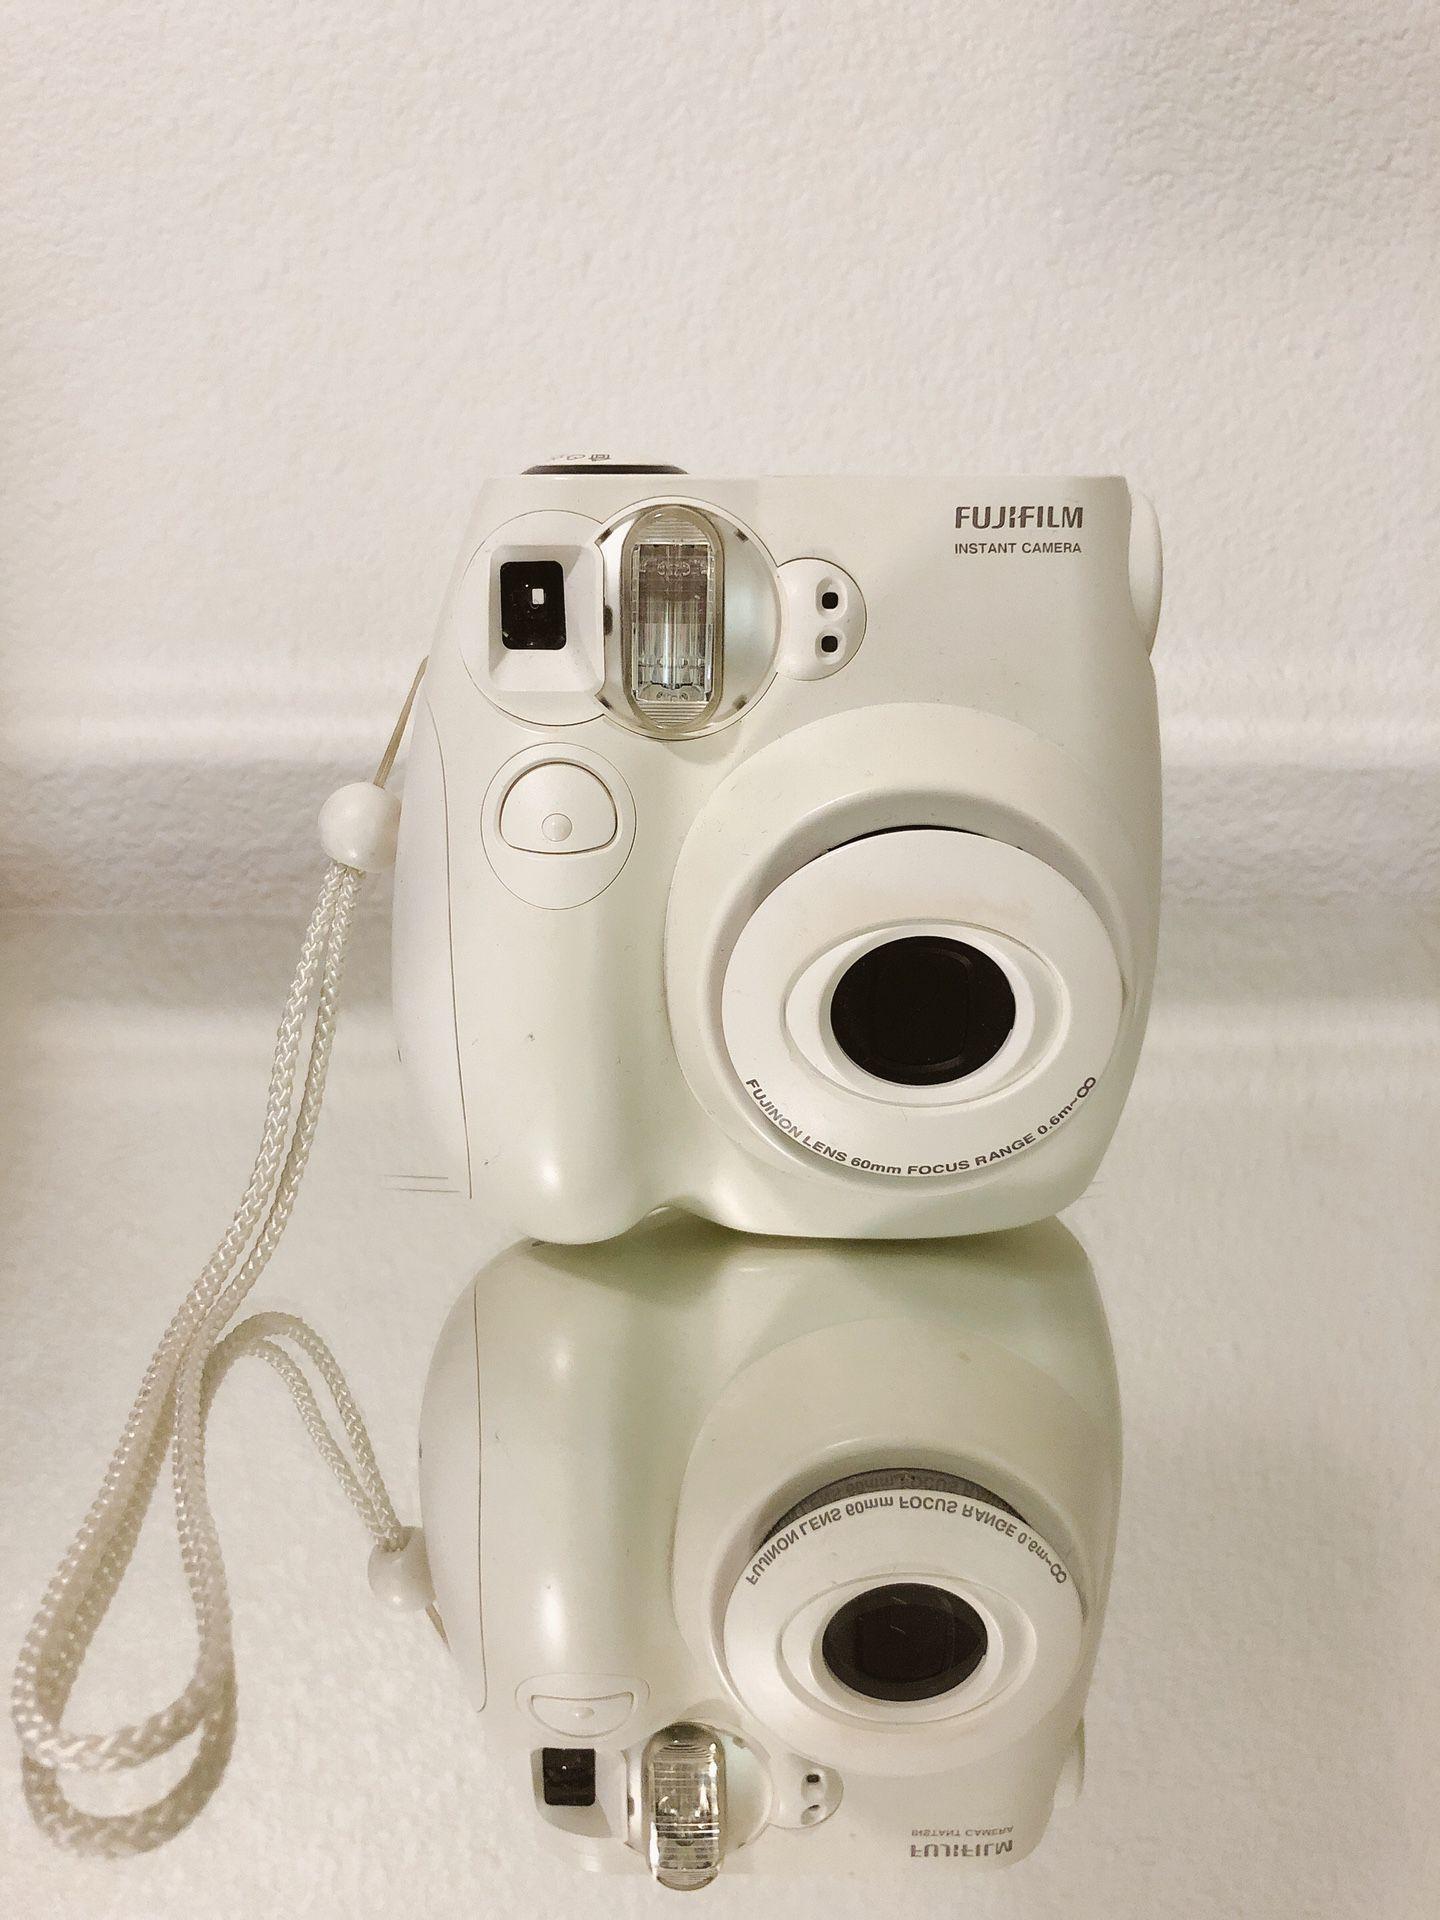 Fuji film Instax 7s white camera